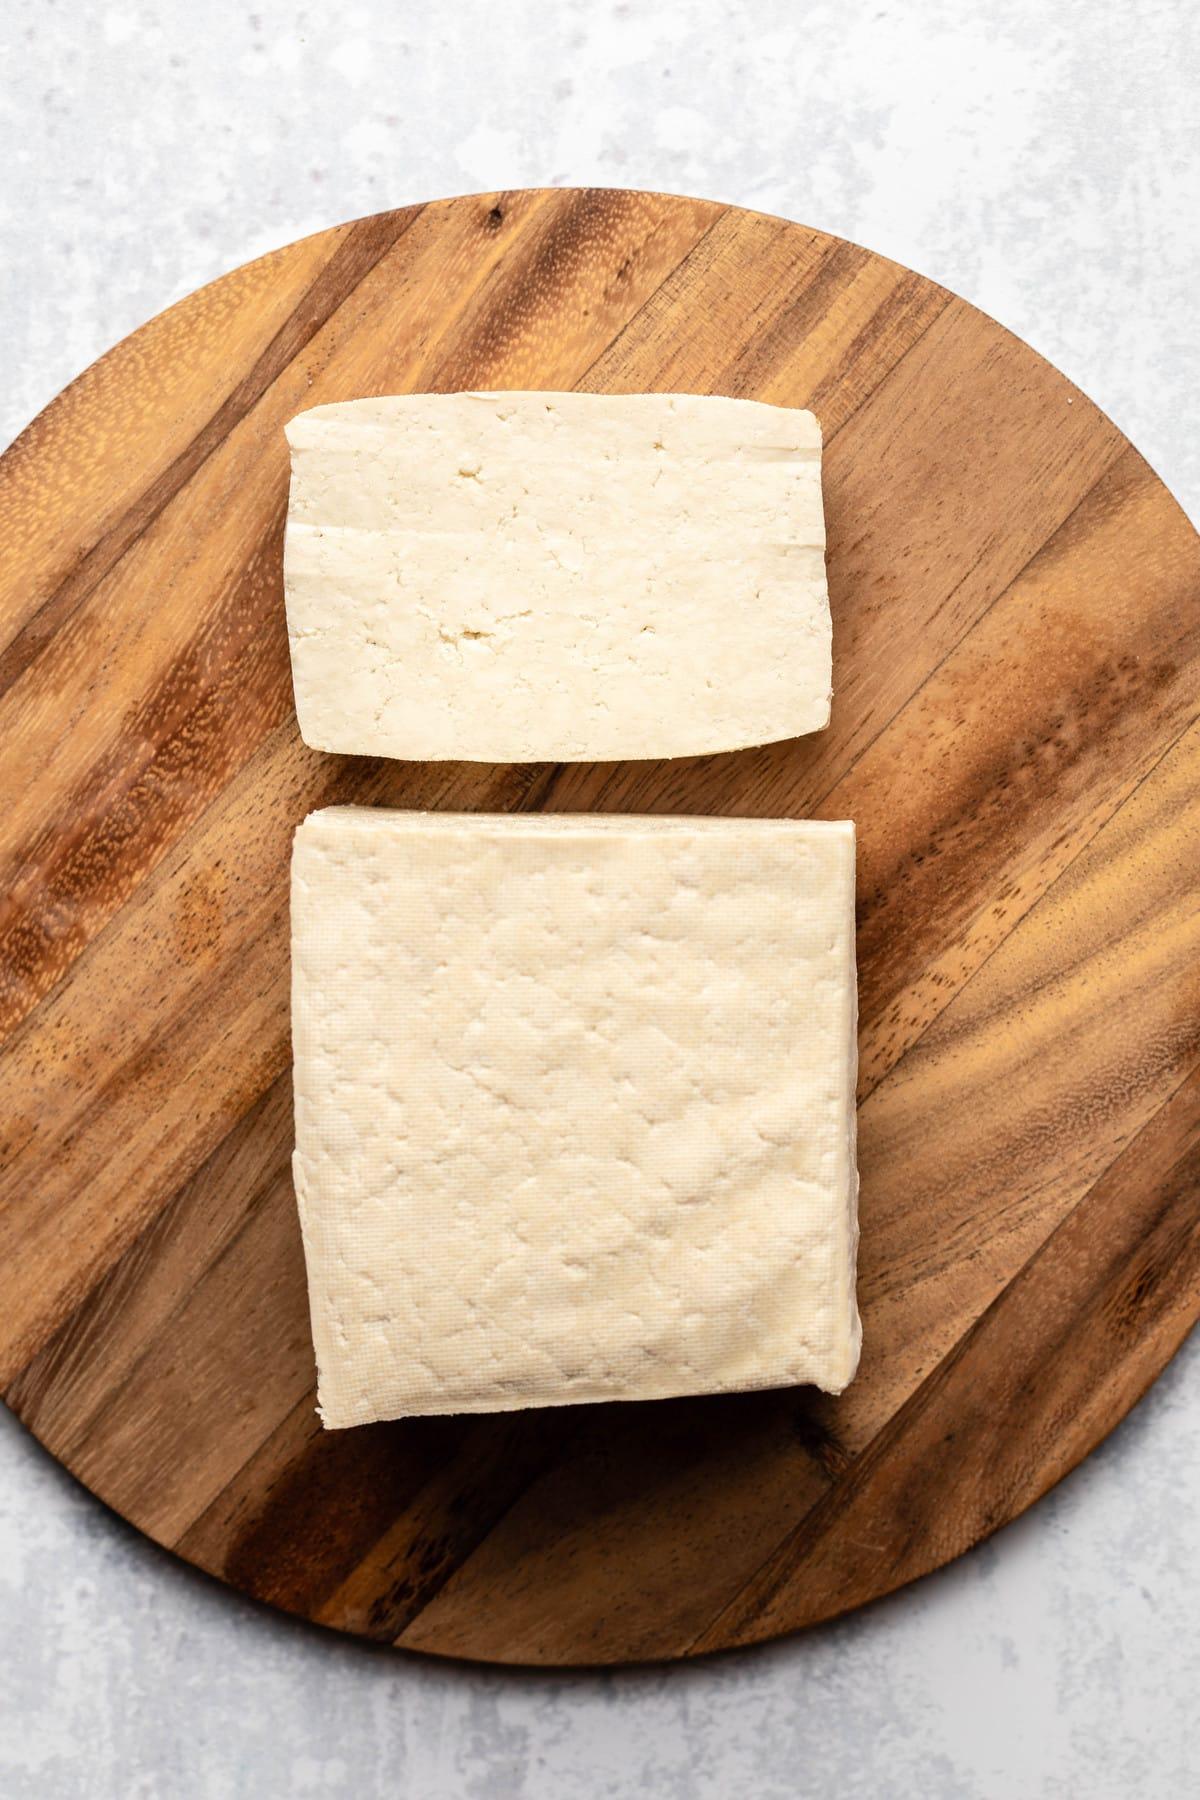 block of super firm tofu on round wood cutting board